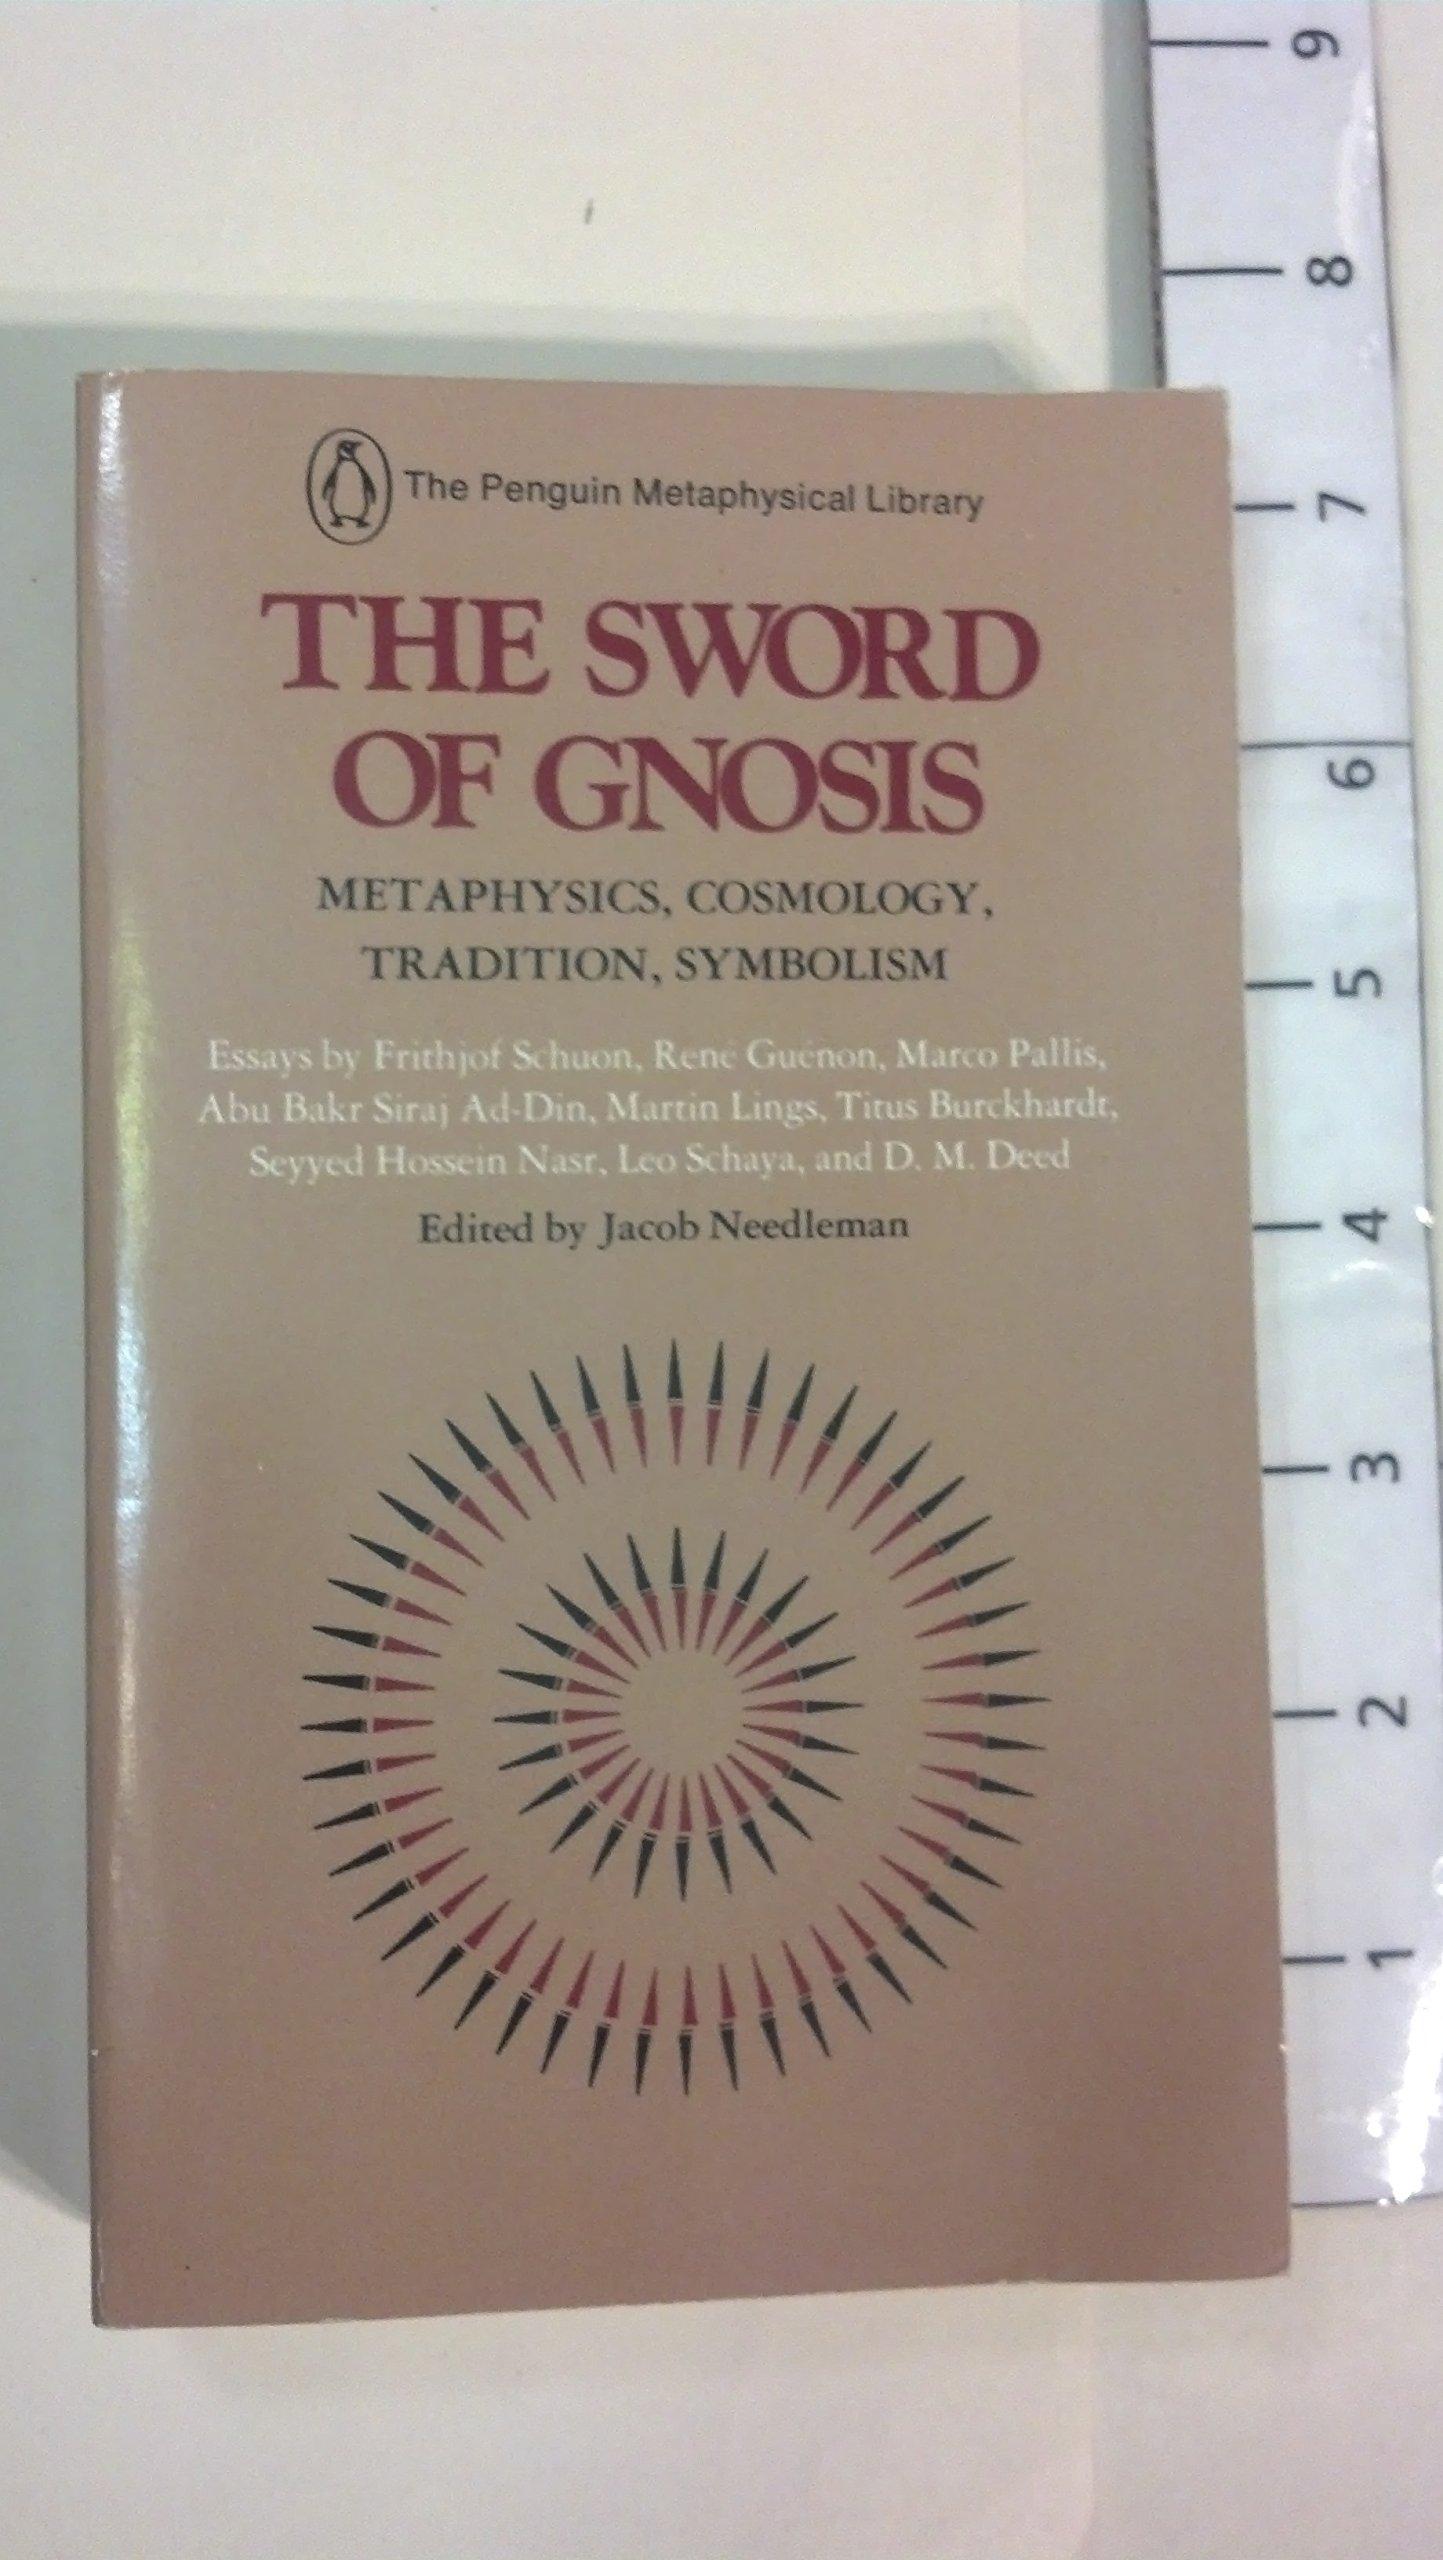 The Sword Of Gnosis Metaphysics Cosmology Tradition Symbolism